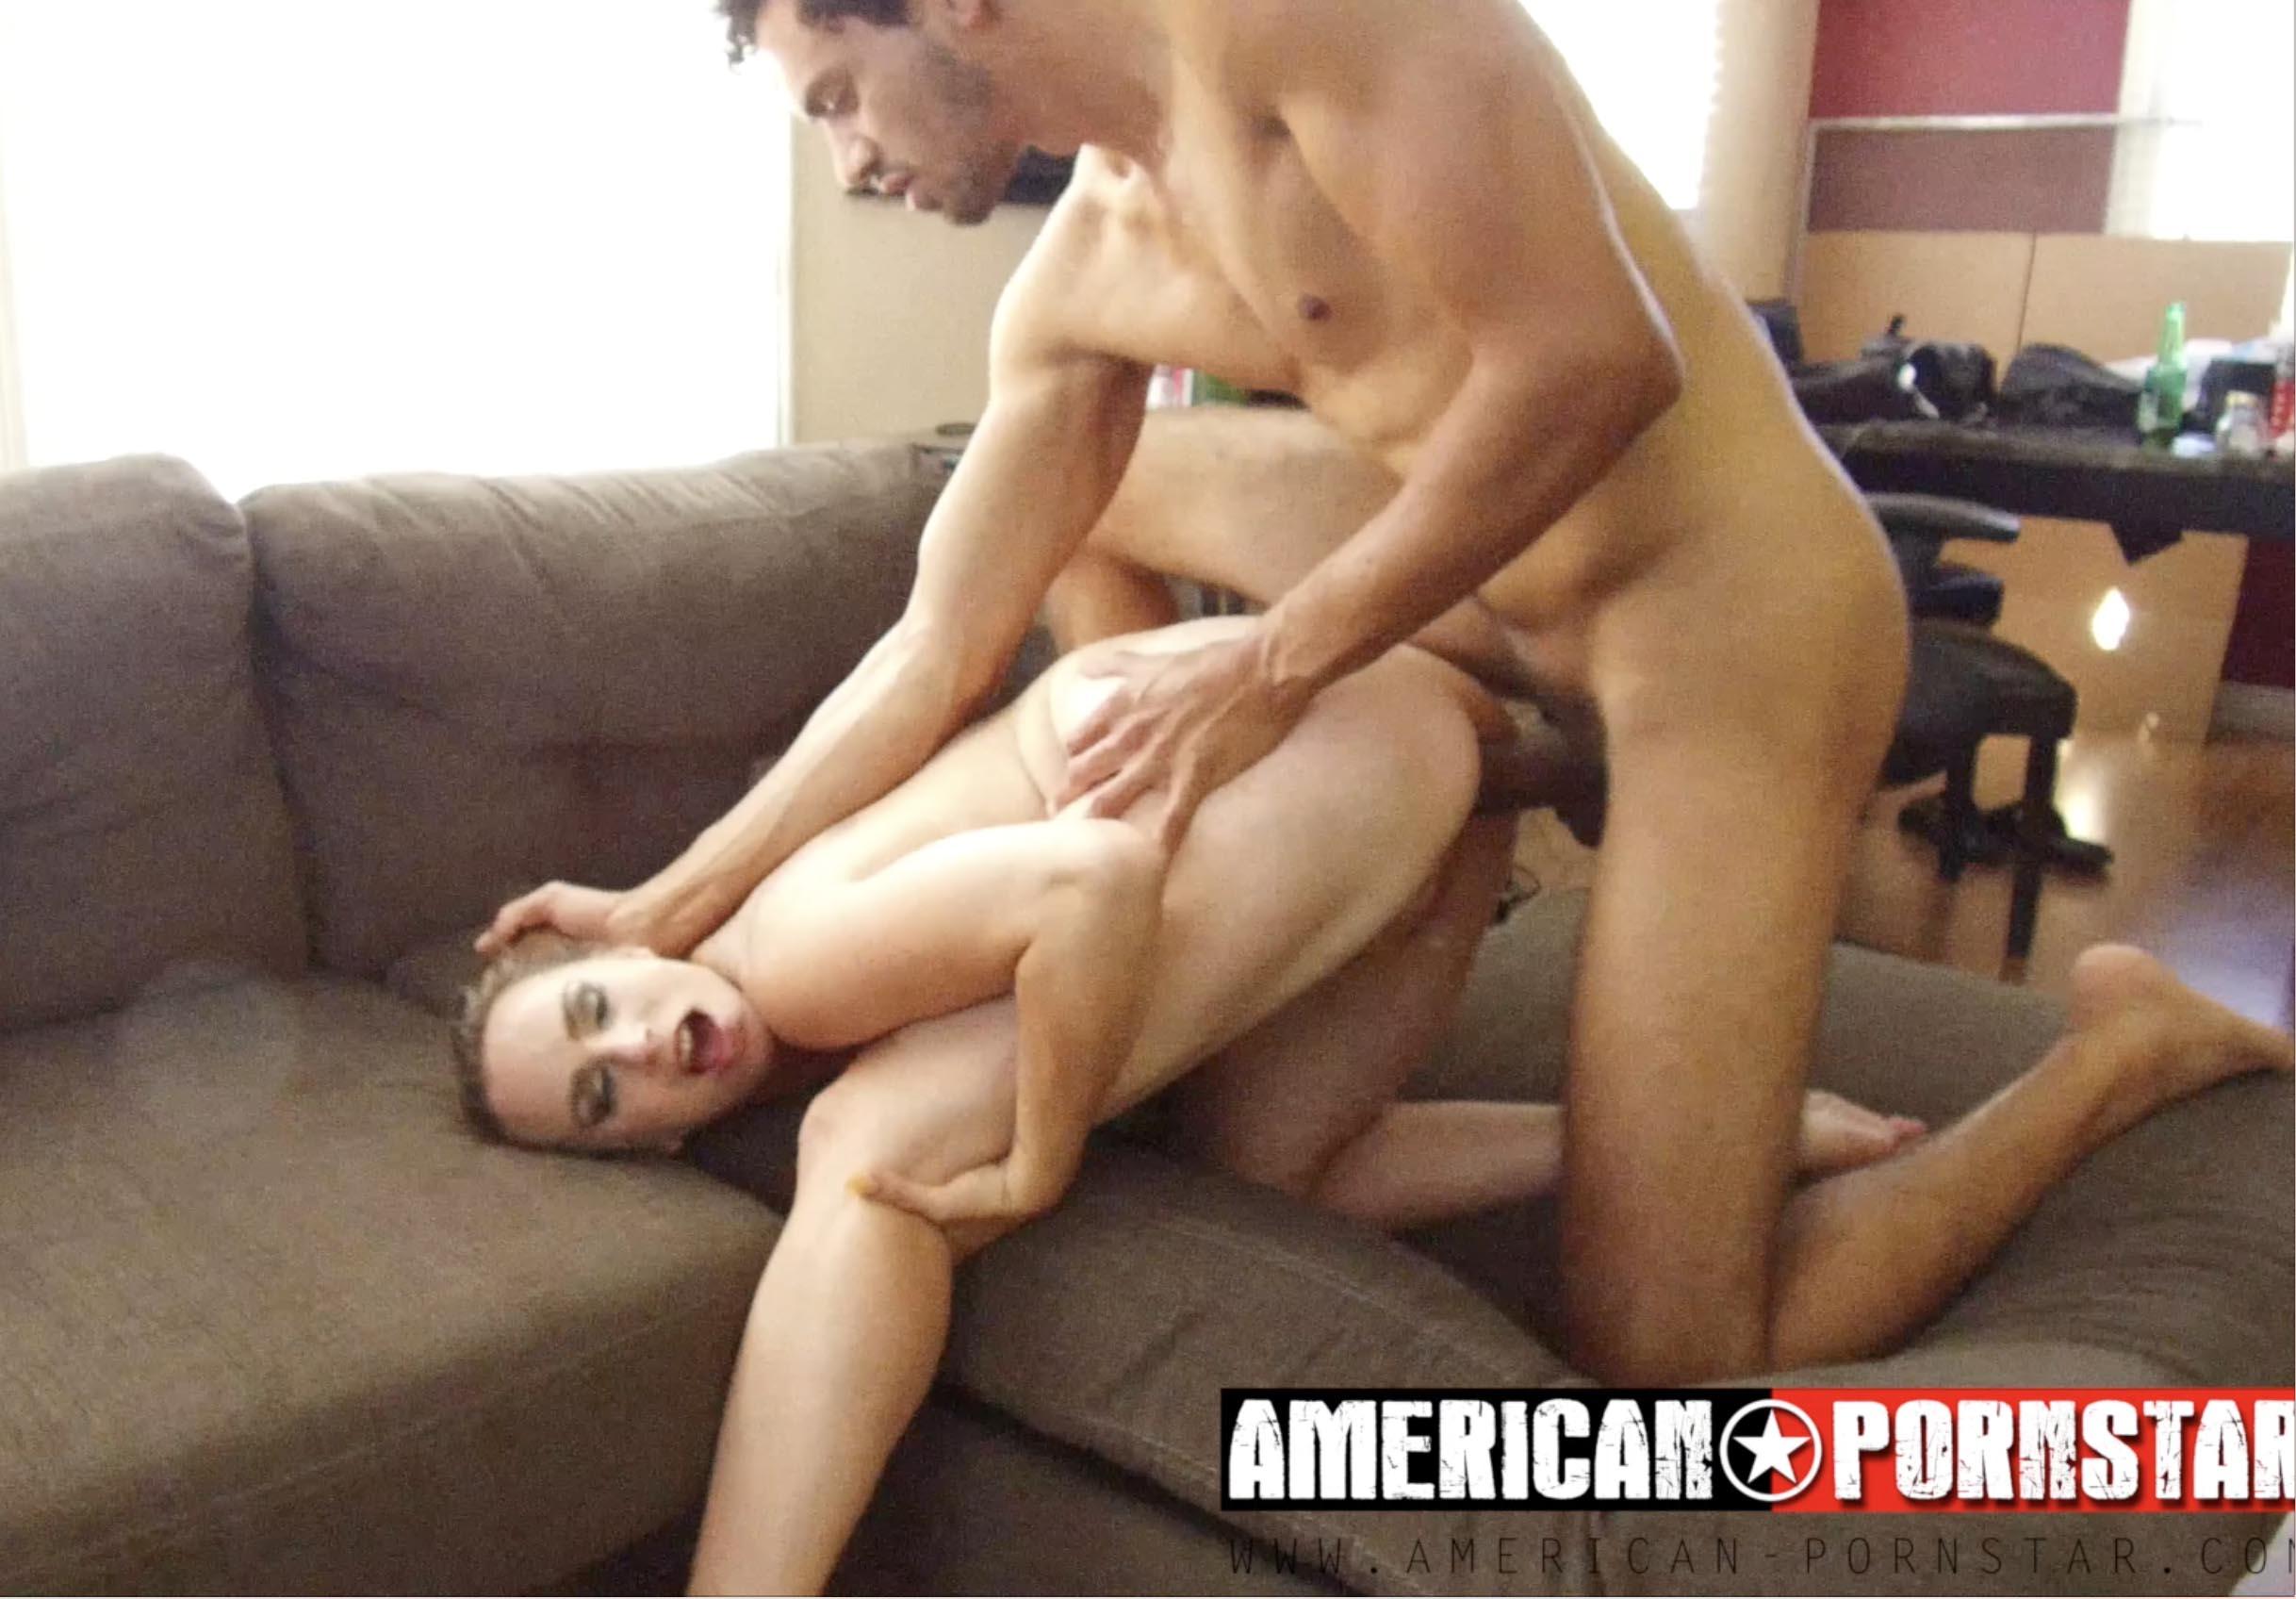 bella rossi american pornstar